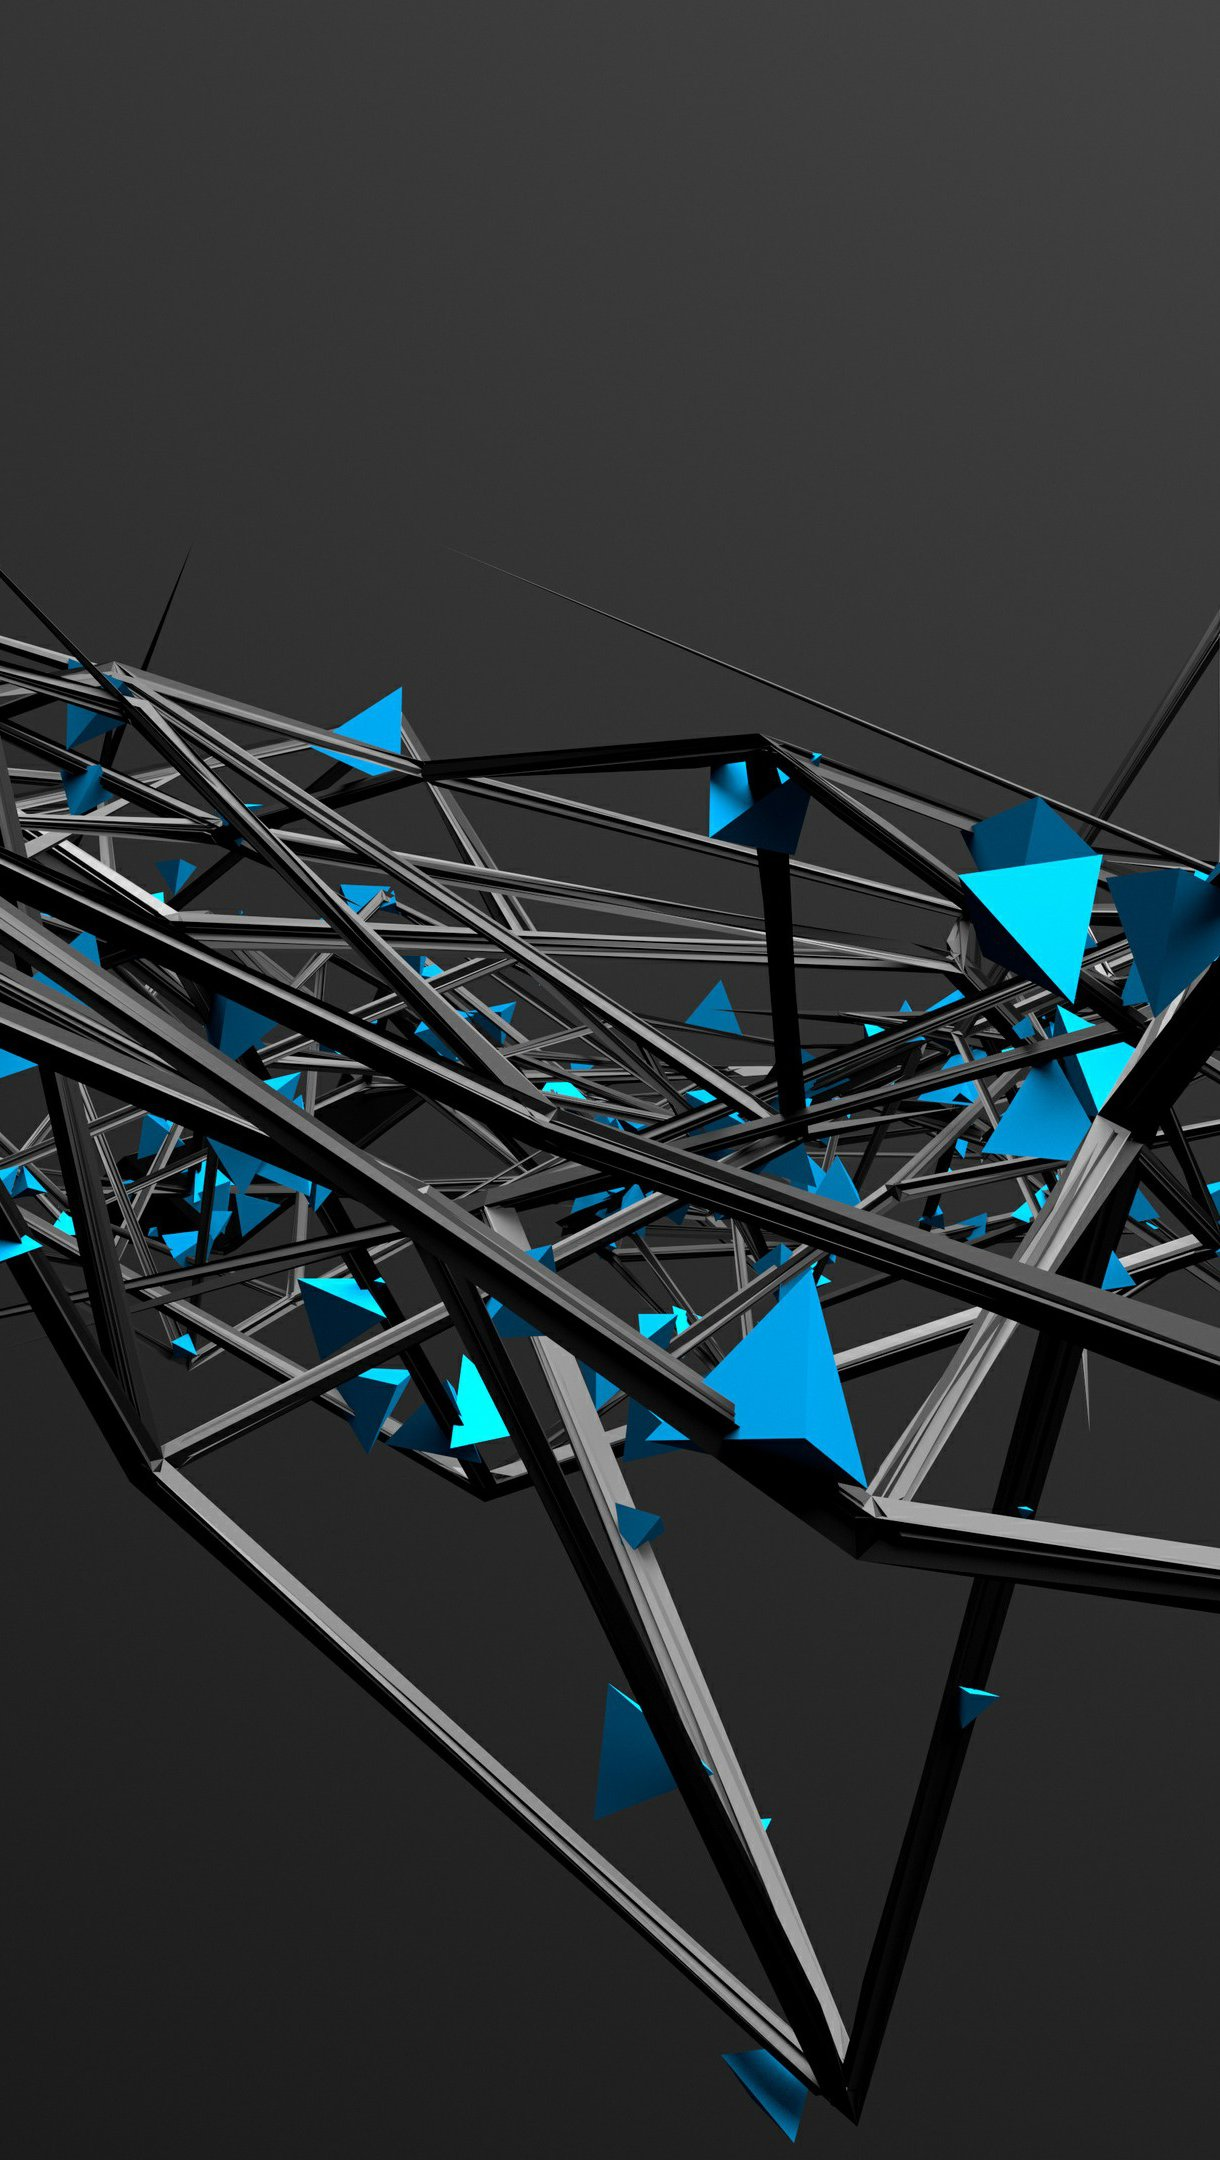 Wallpaper 3D Abstract Structure Vertical